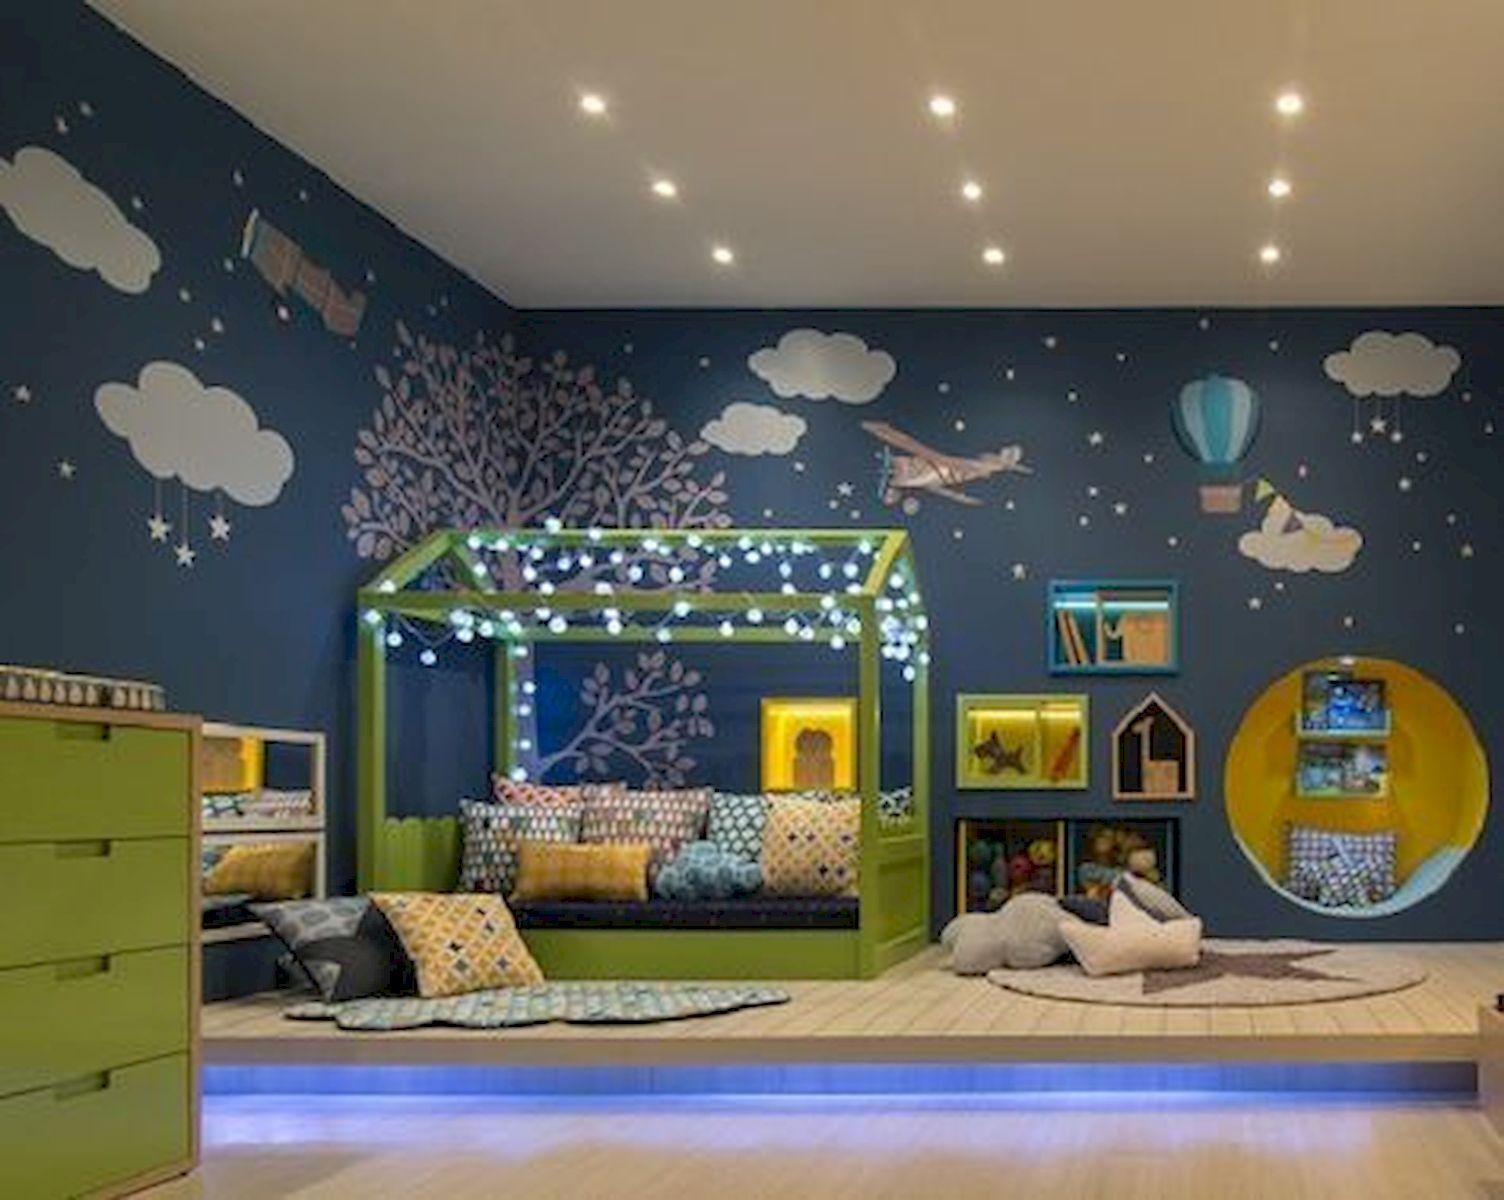 Kids Room Decorating Ideas images